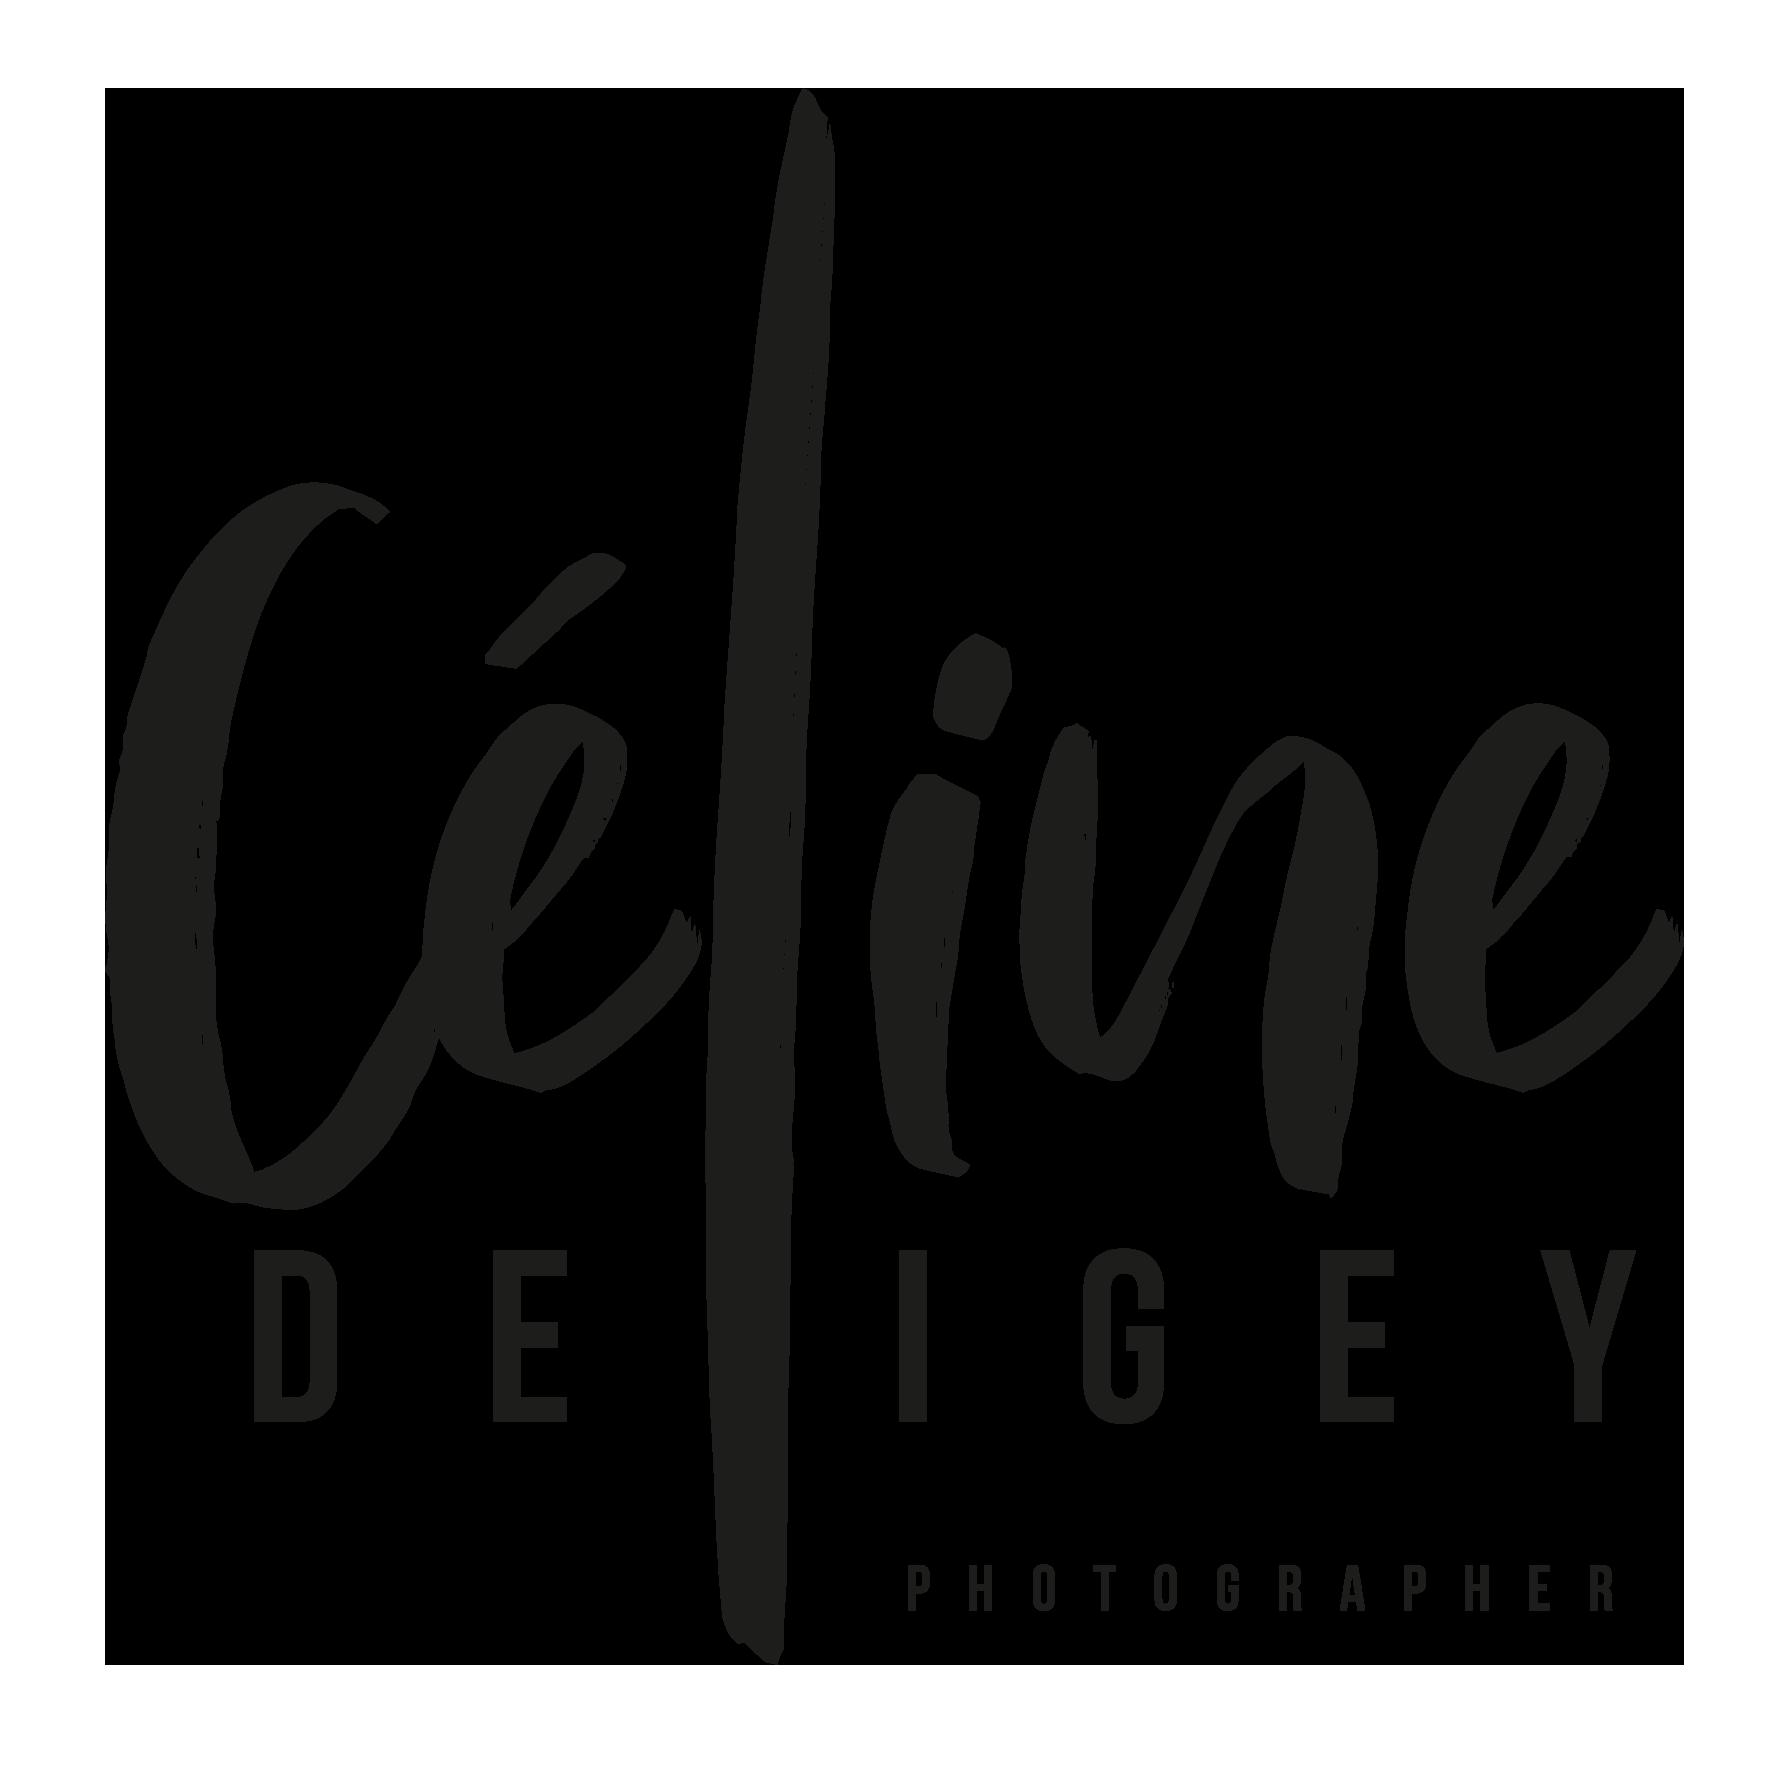 Celine Deligey Photographer